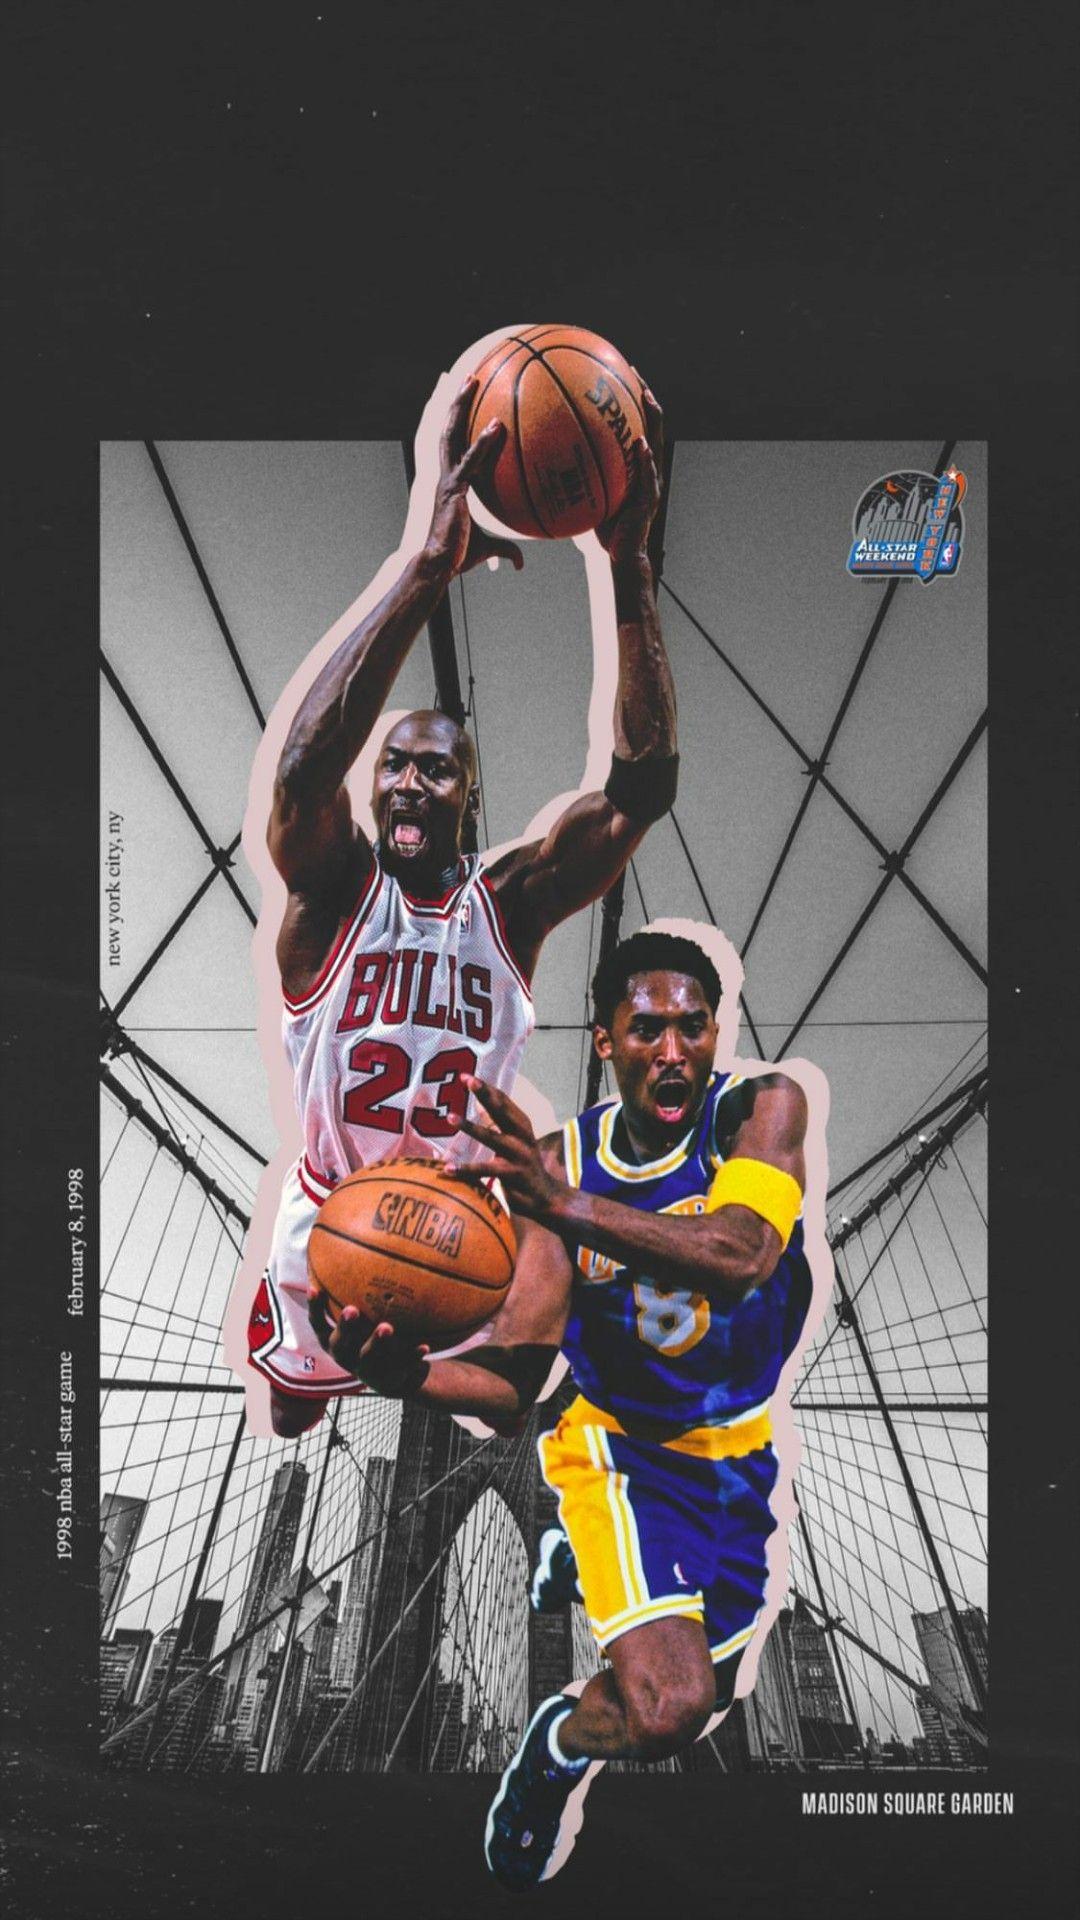 Kobe Jordan Kobe Bryant Pictures Kobe Bryant Kobe Iphone kobe and michael jordan wallpaper